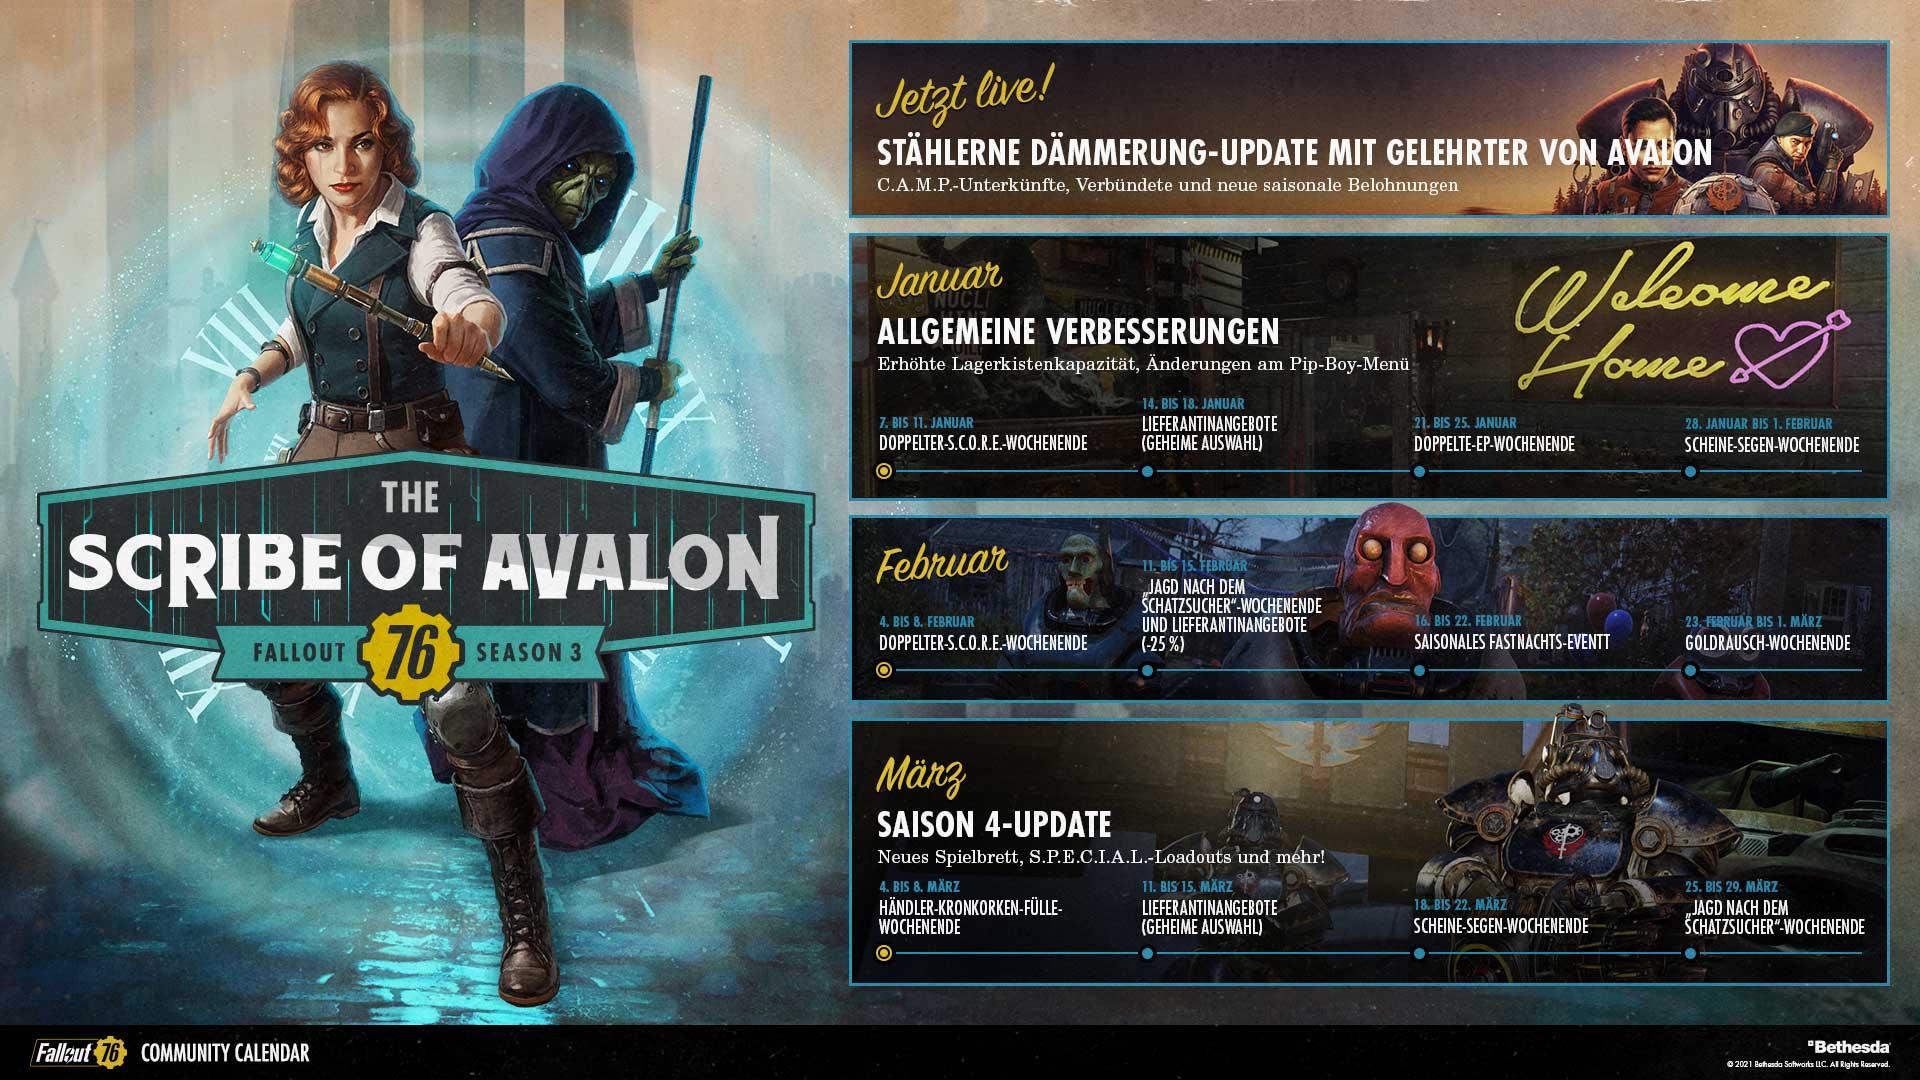 Fallout76_Season3_CommunityCalendar-01-DE.jpg